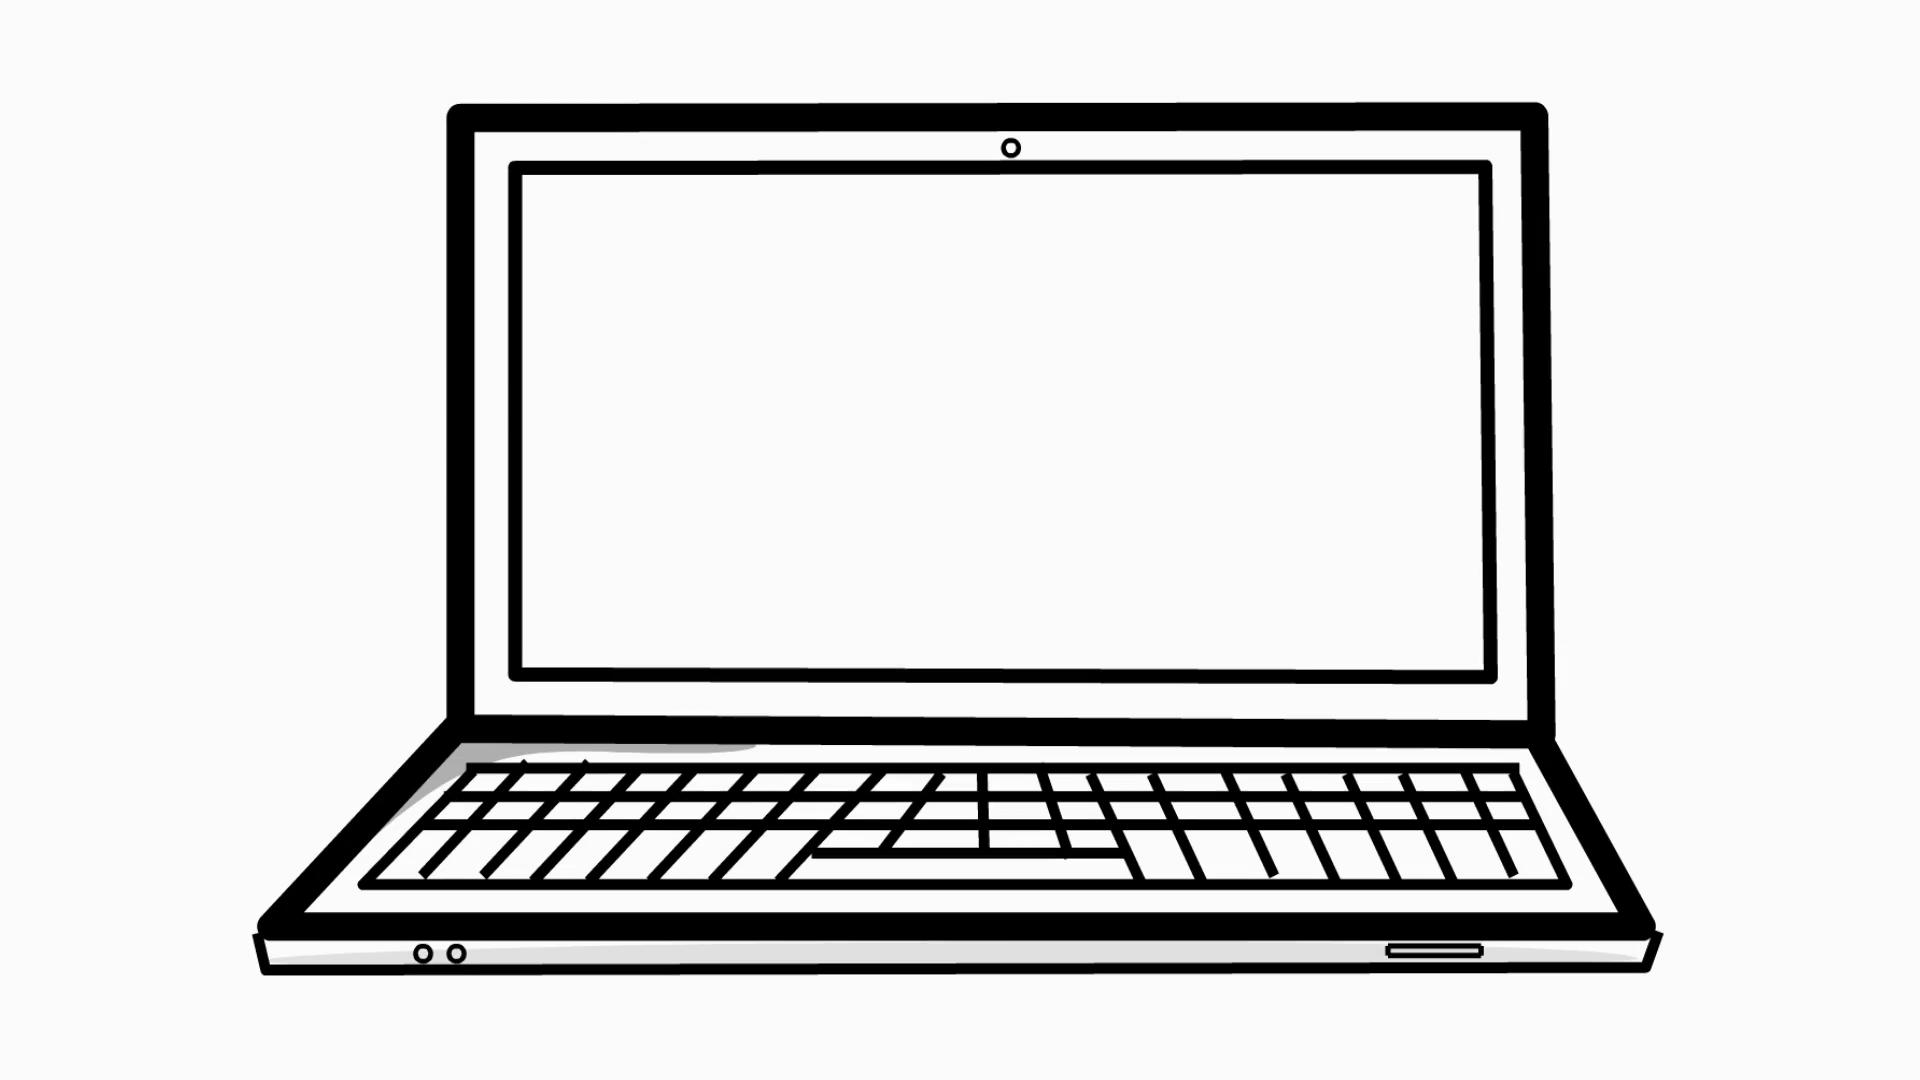 3320 Laptop free clipart.